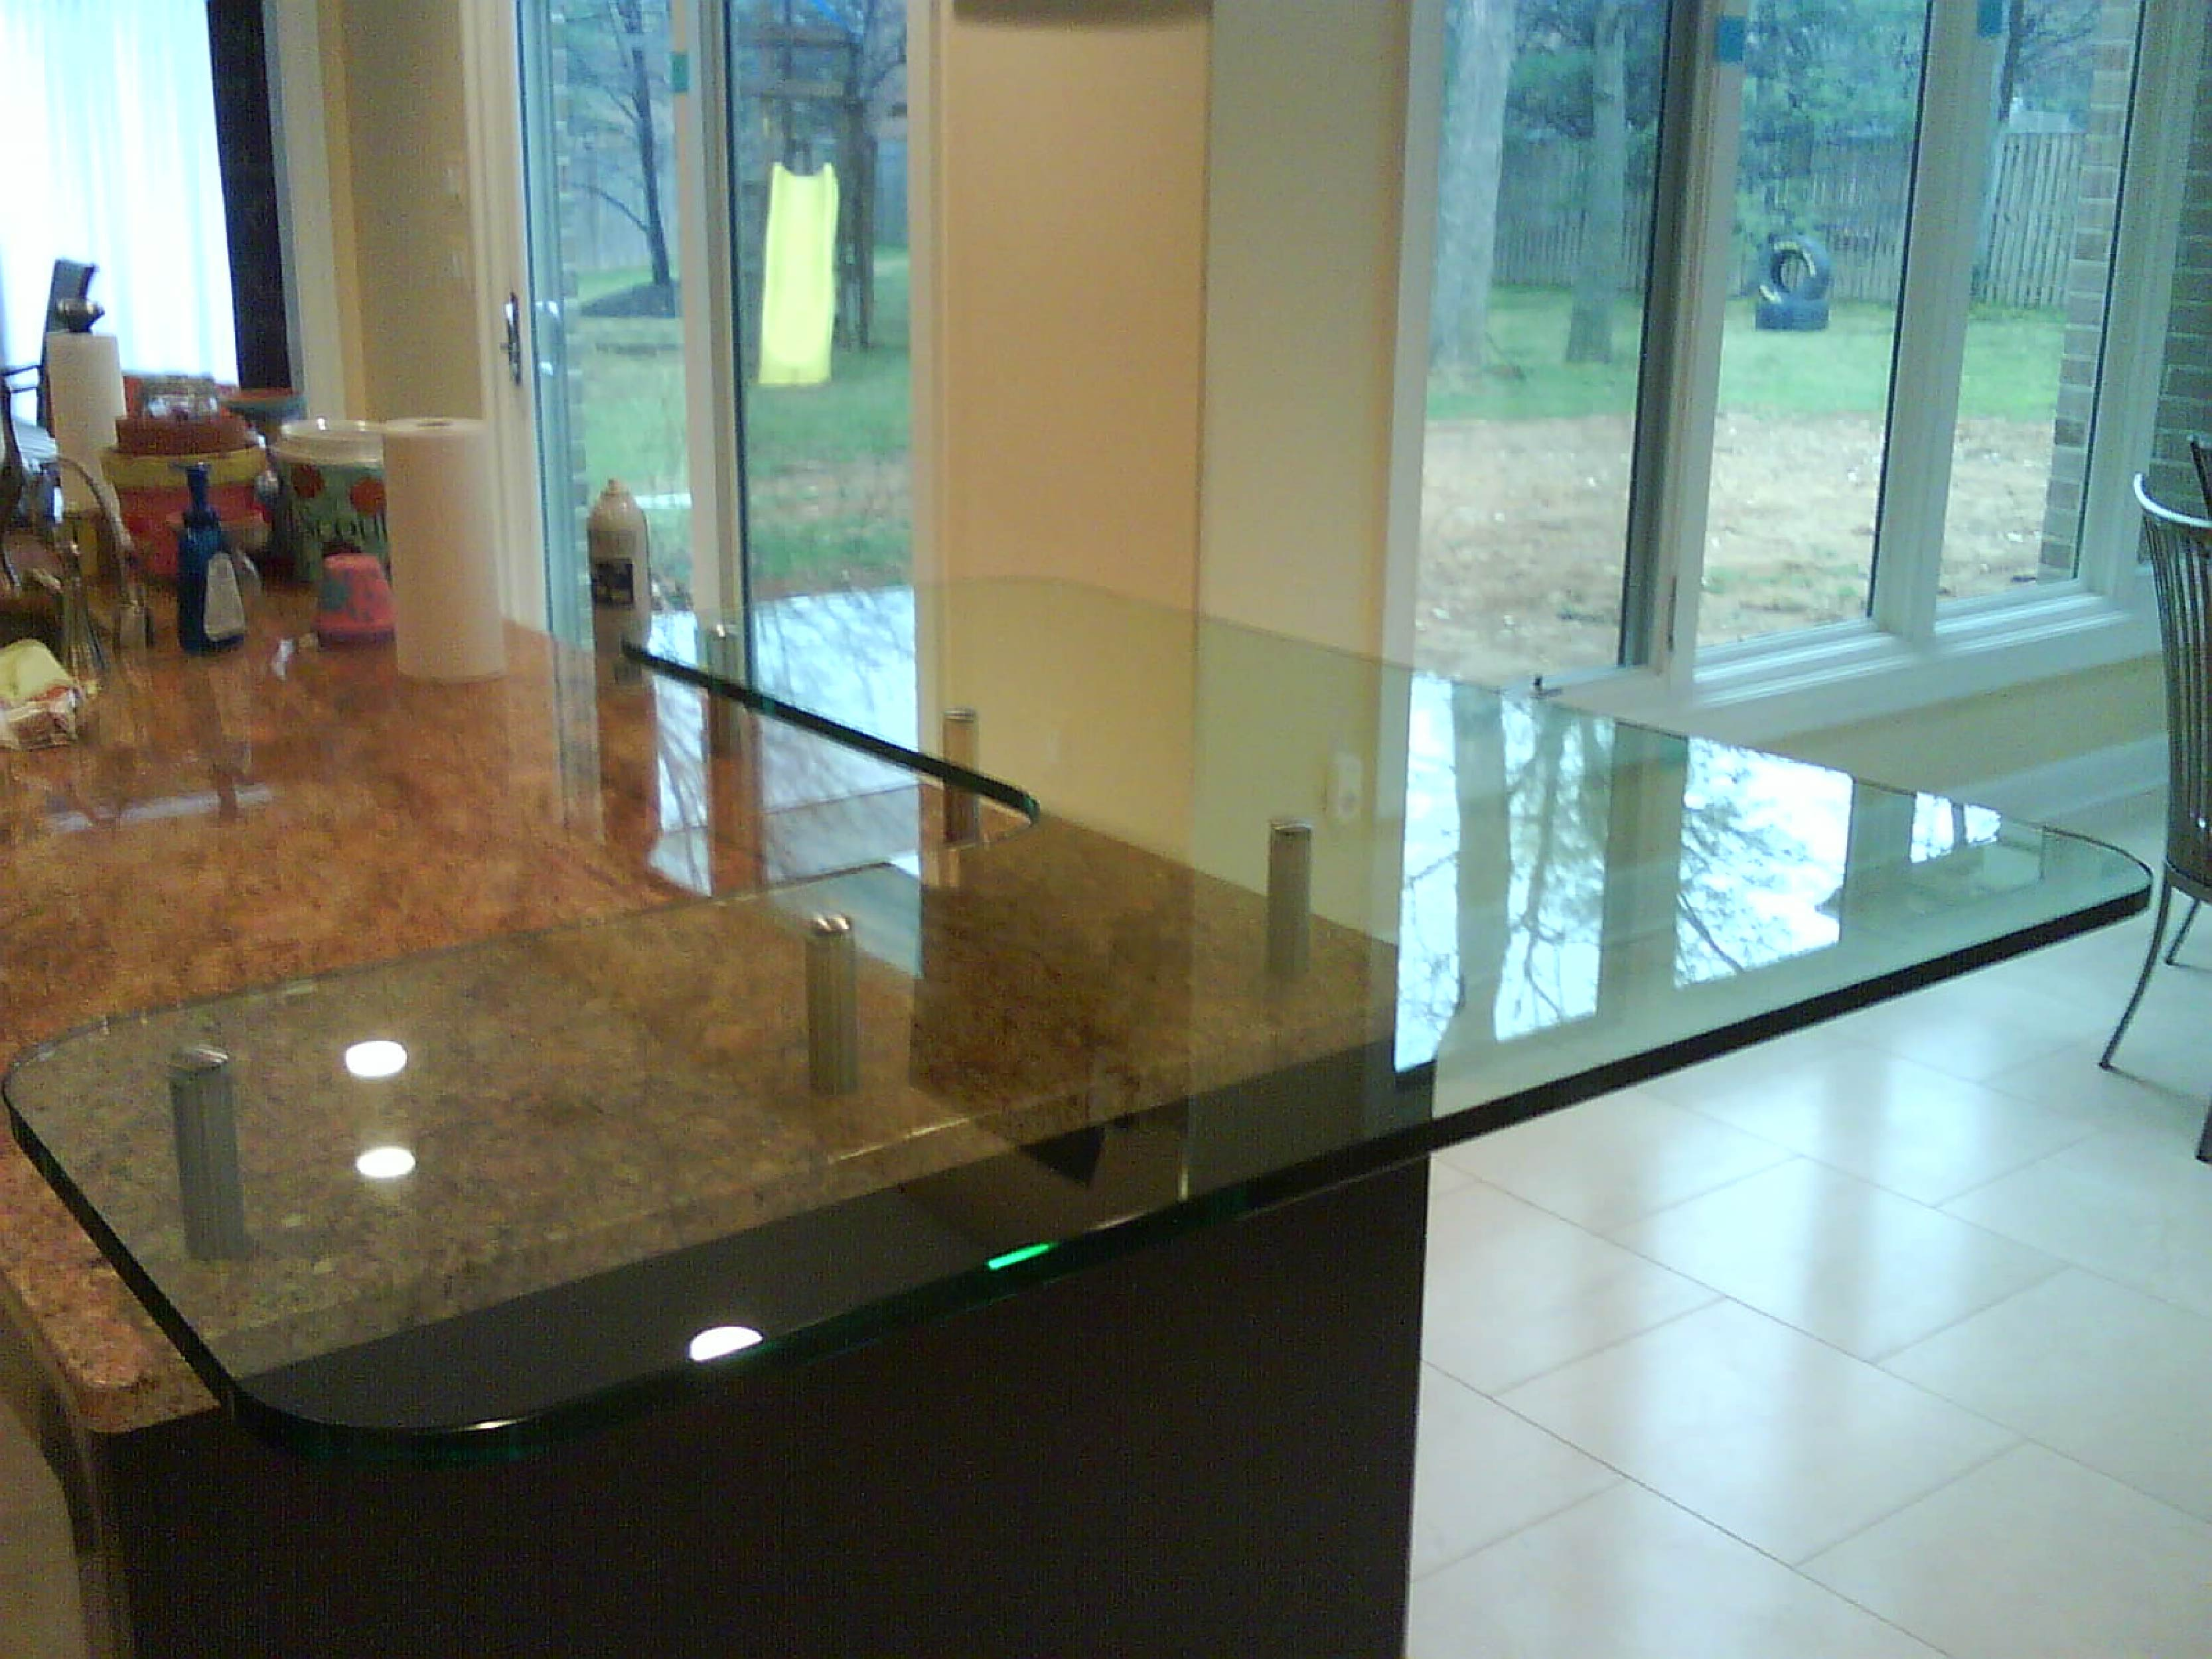 Recent blog posts - Glass & Mirror Blog